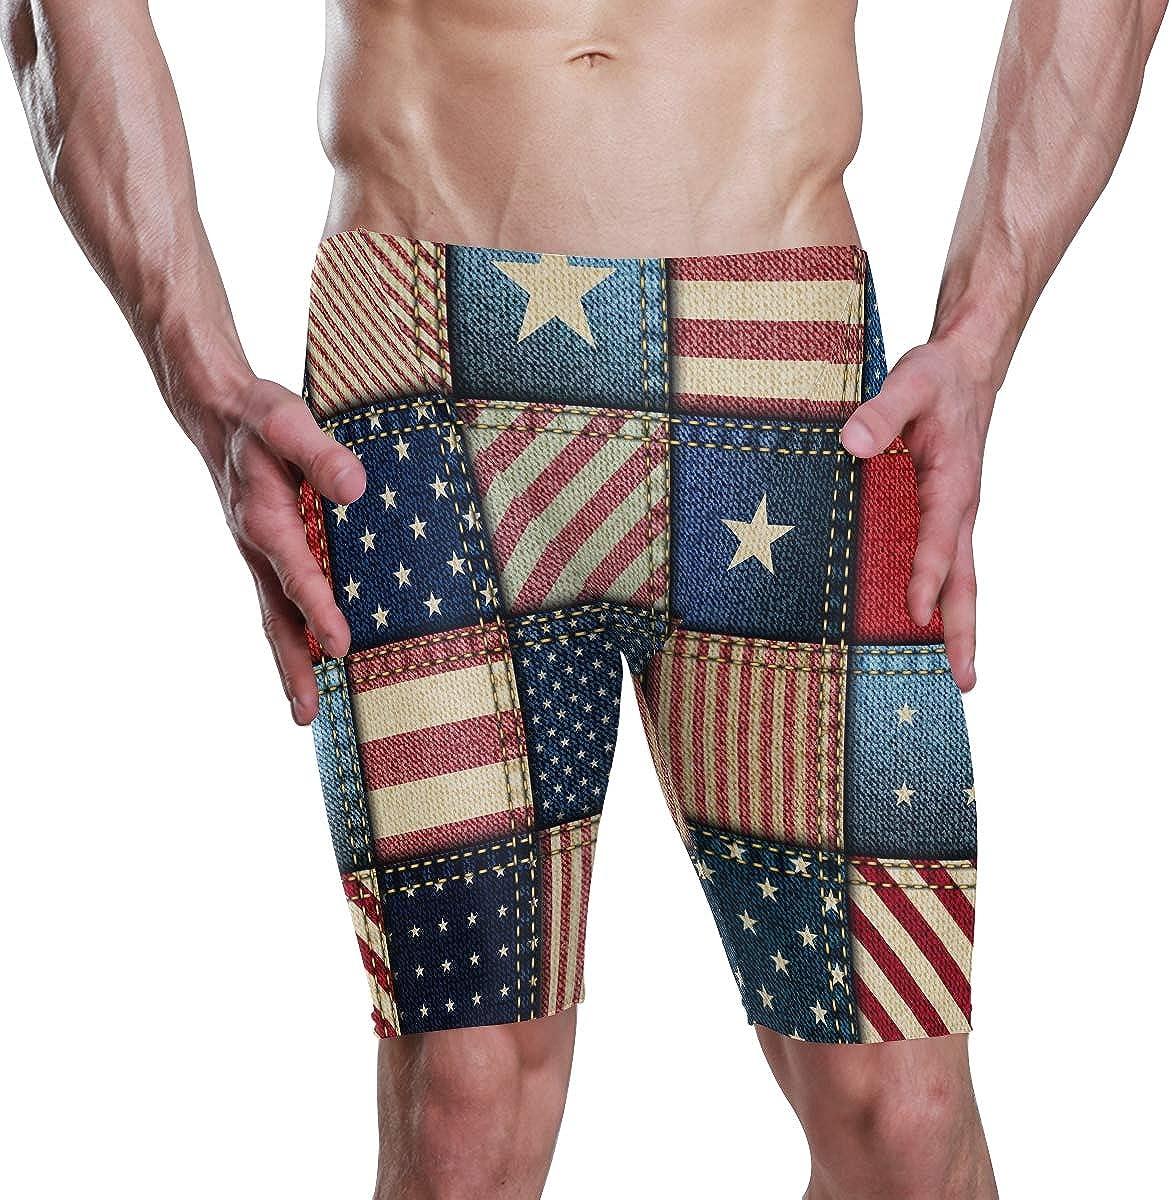 American Flag Patriotic Men Jammer Briefs Trunks Swimsuit Swimwear Bodysuits